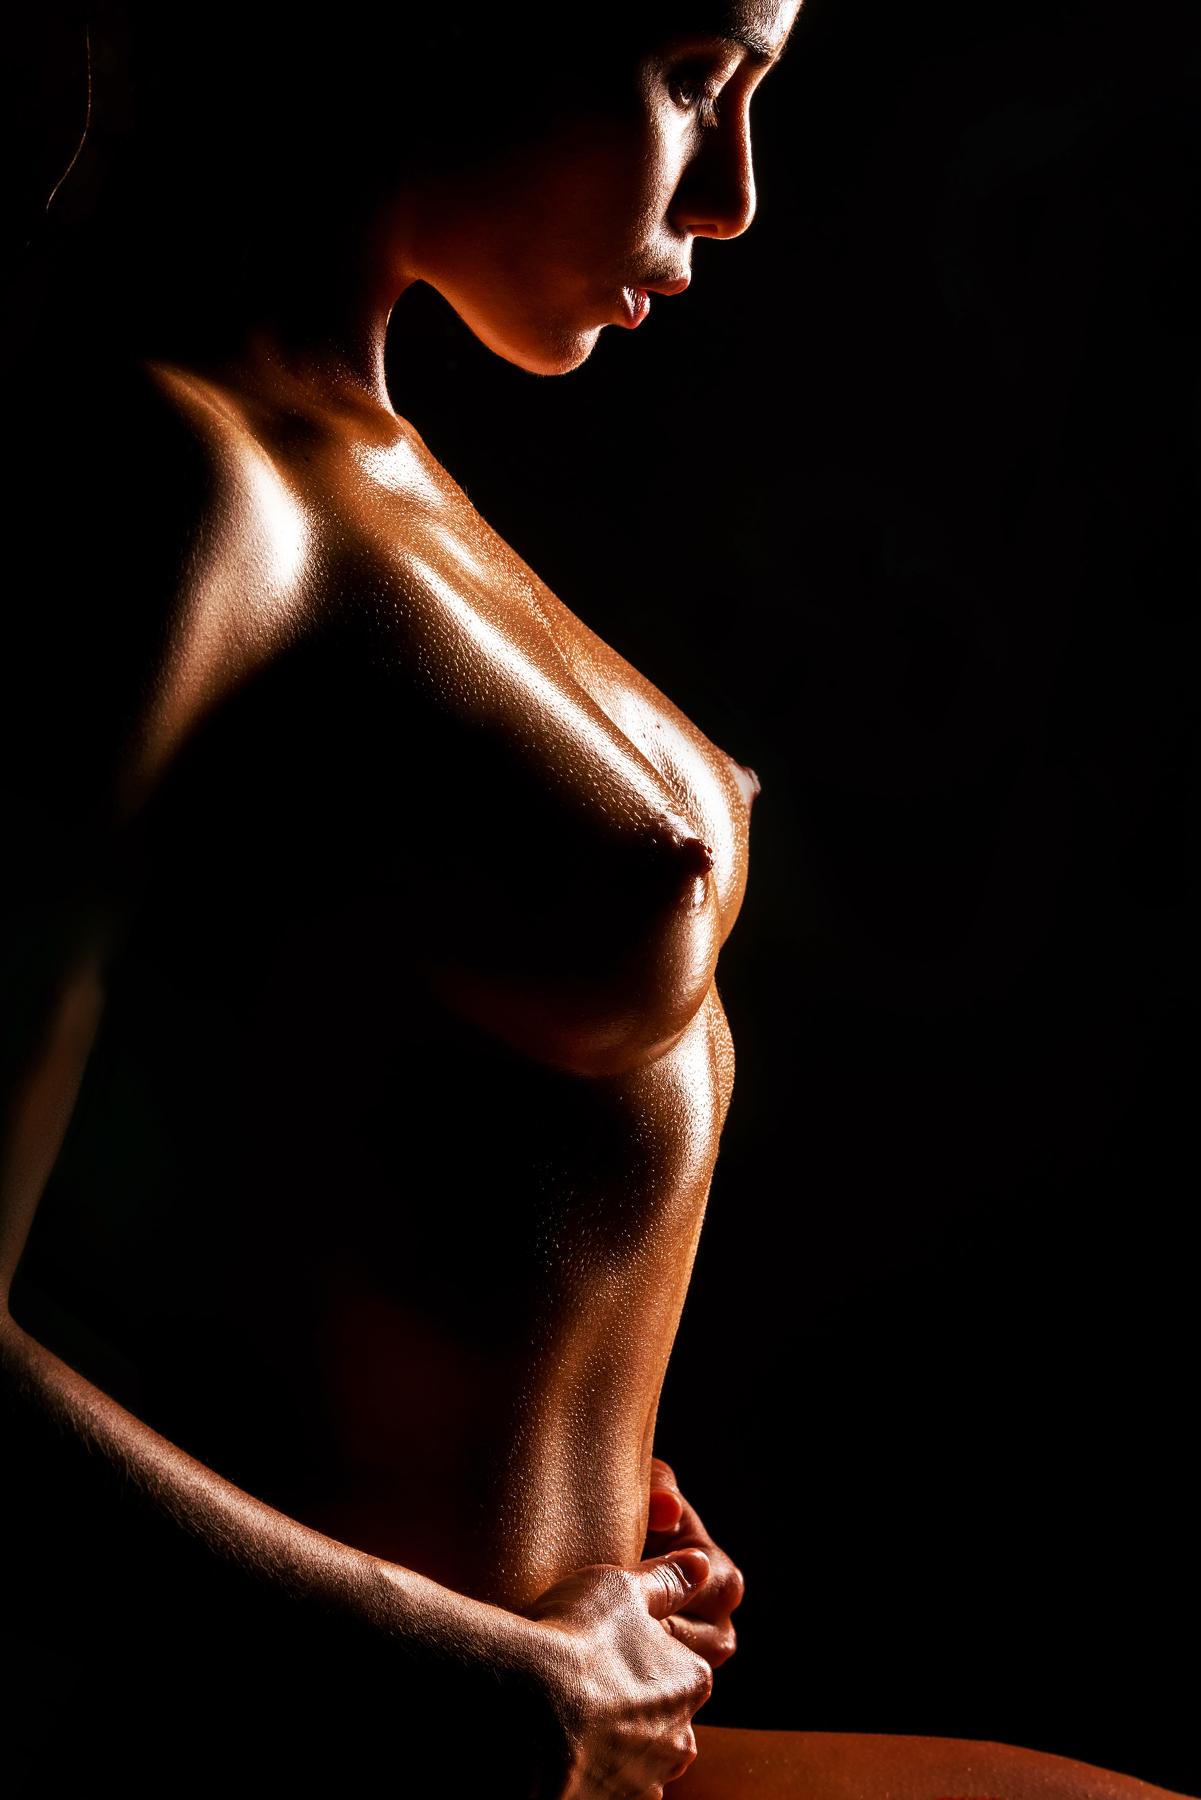 Dark nude portrait